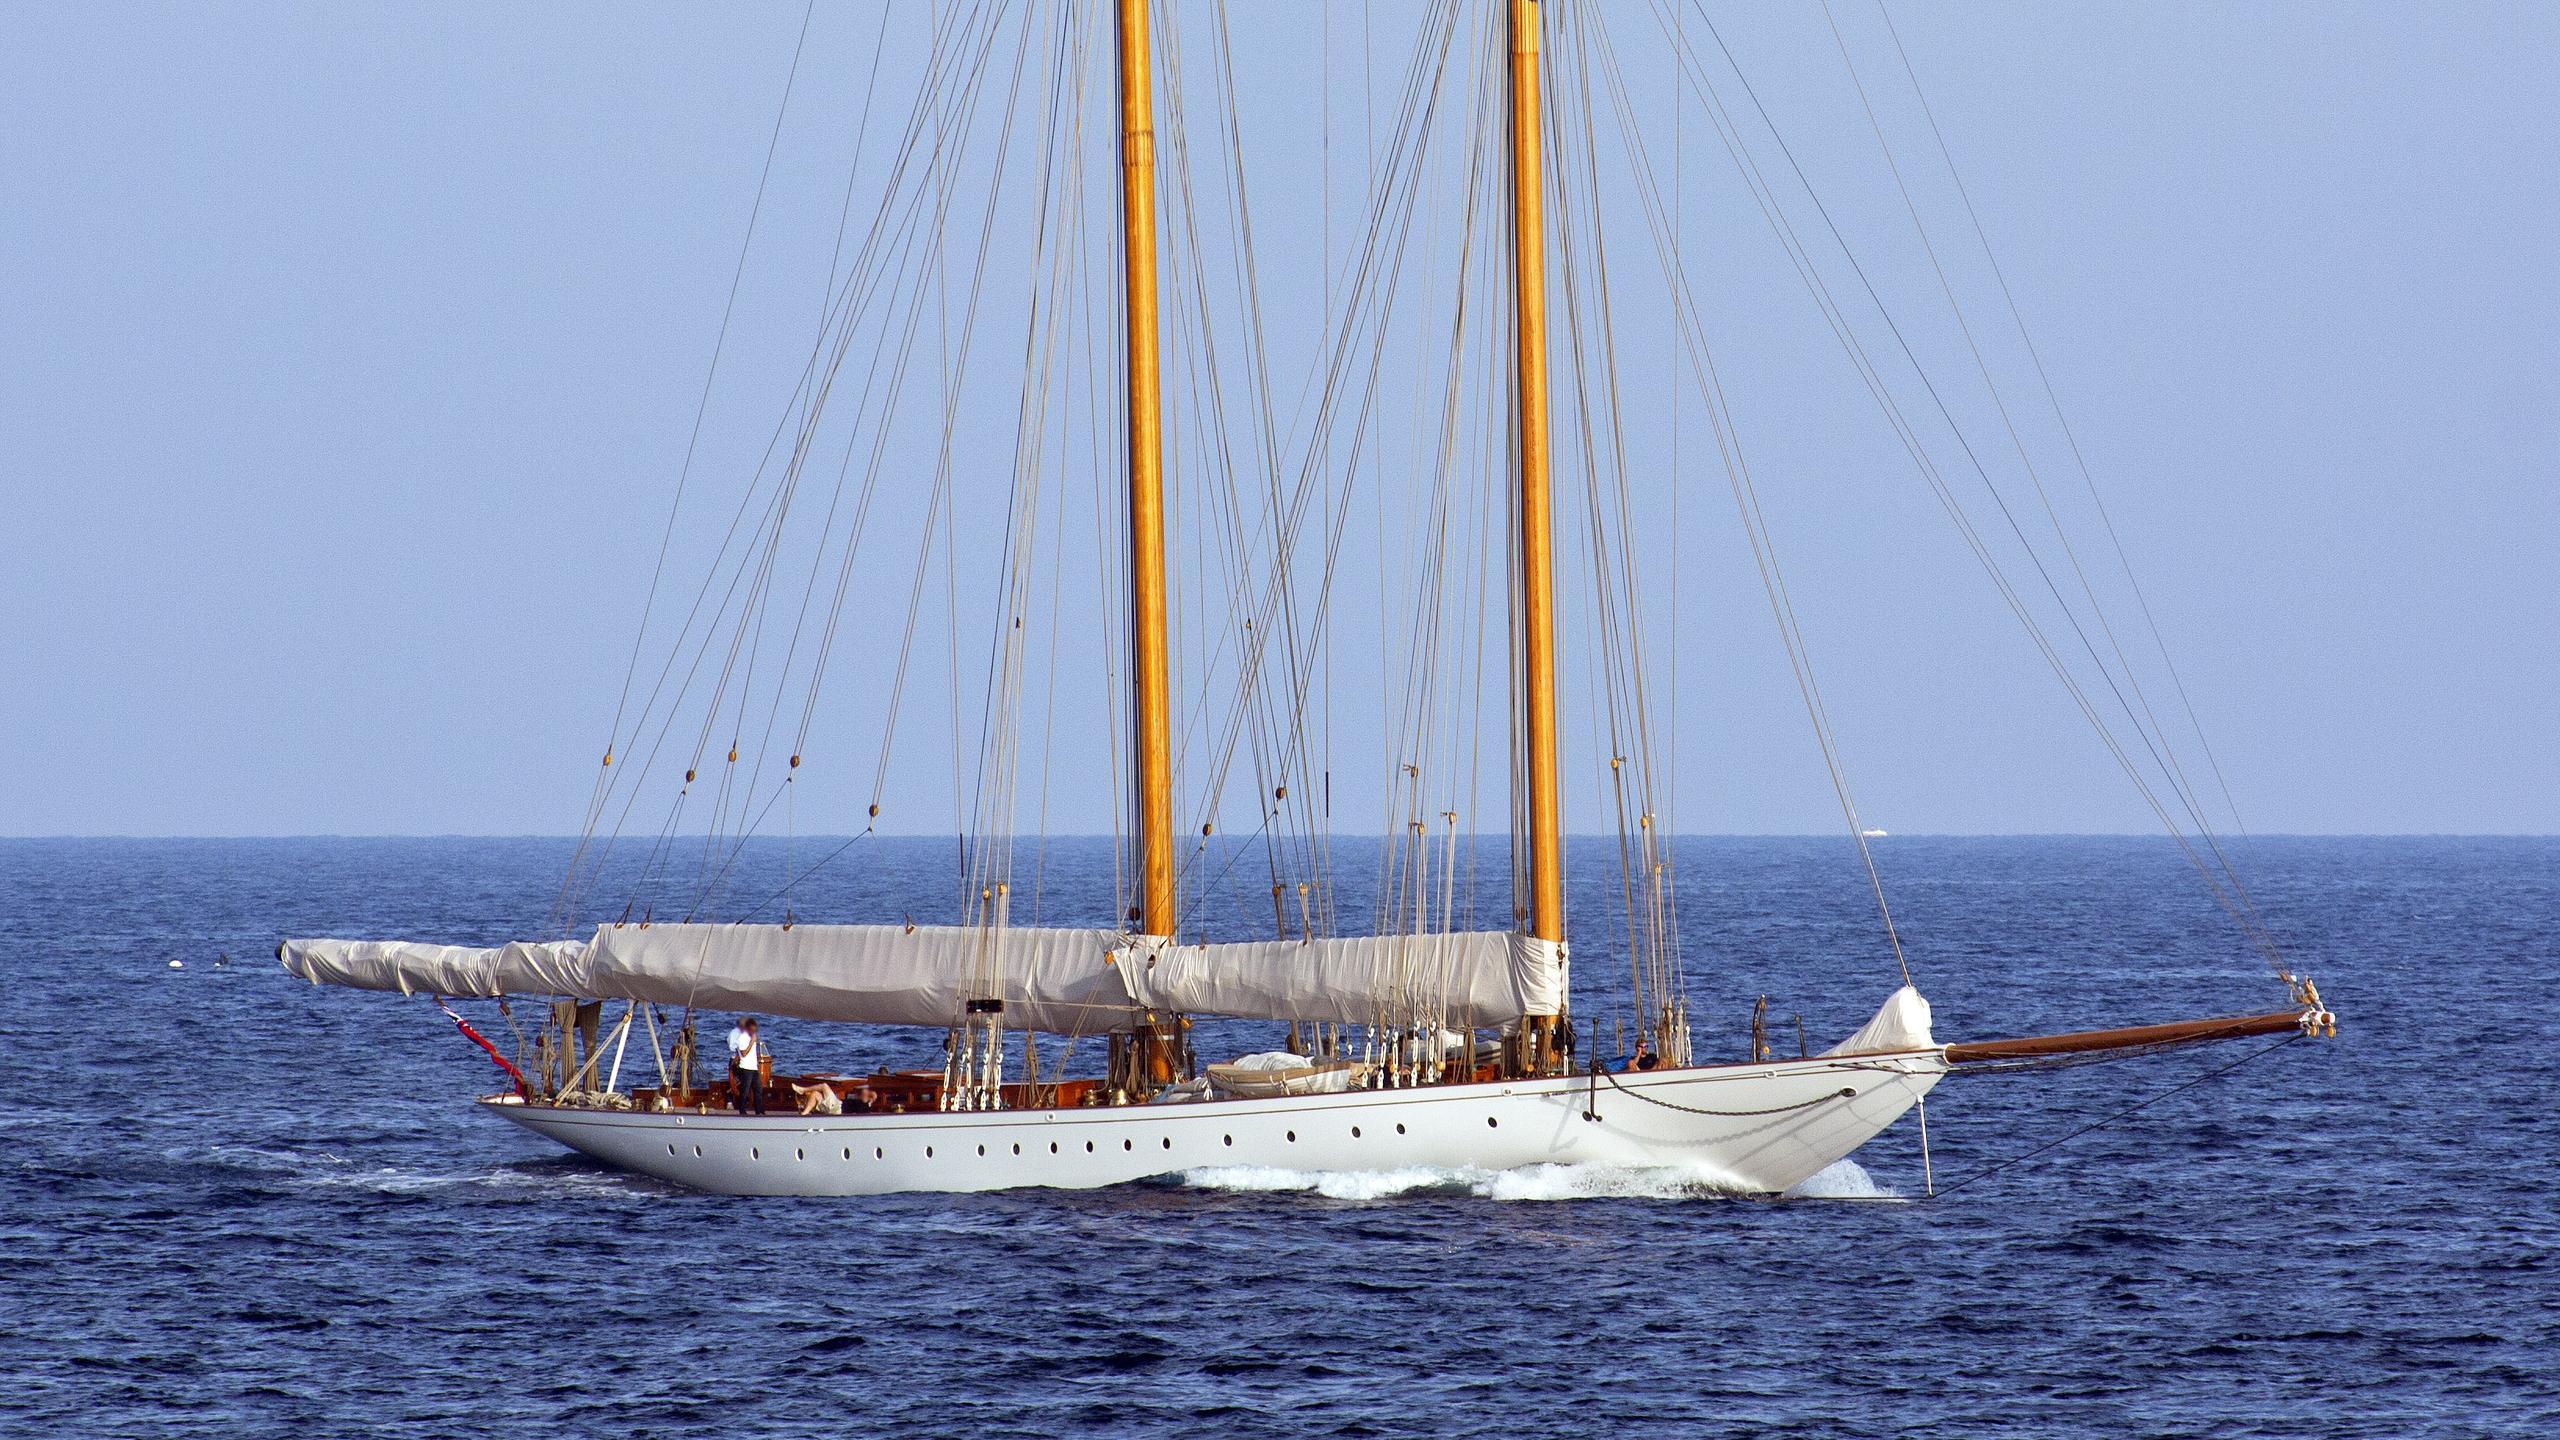 elena-sailing-yacht-fnm-2009-55m-profile